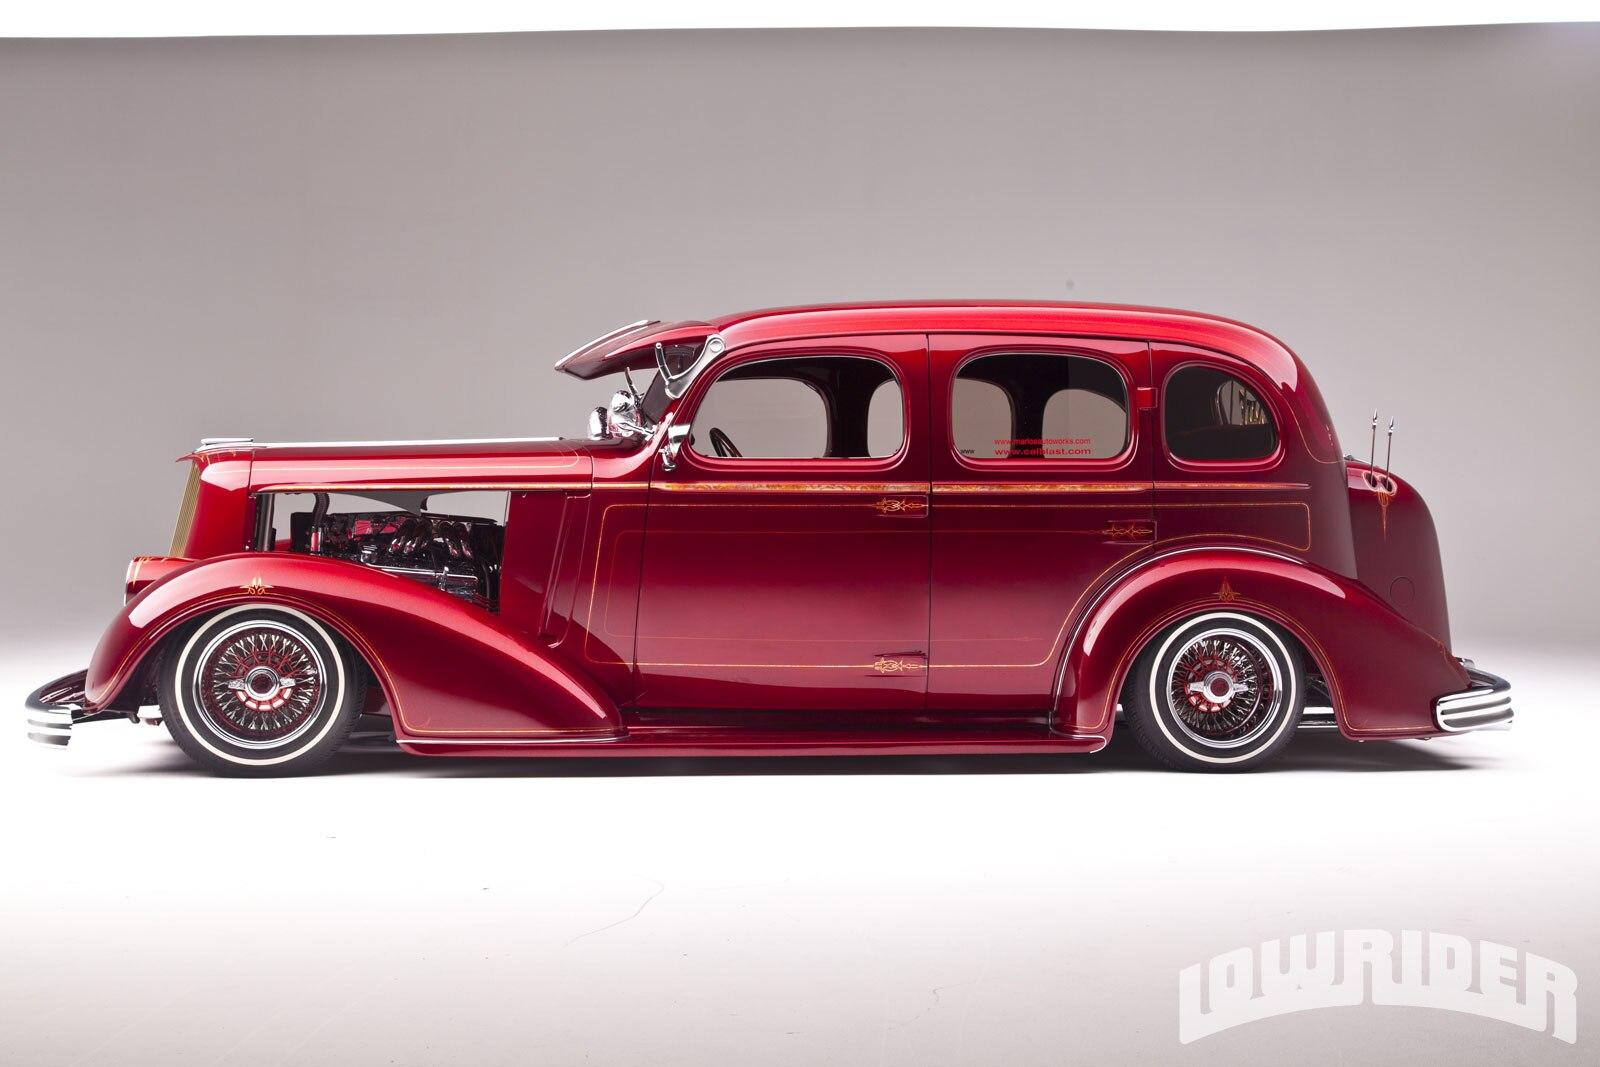 1210-lrmp-13-o-1936-chevrolet-master-deluxe-driver-side-profile1